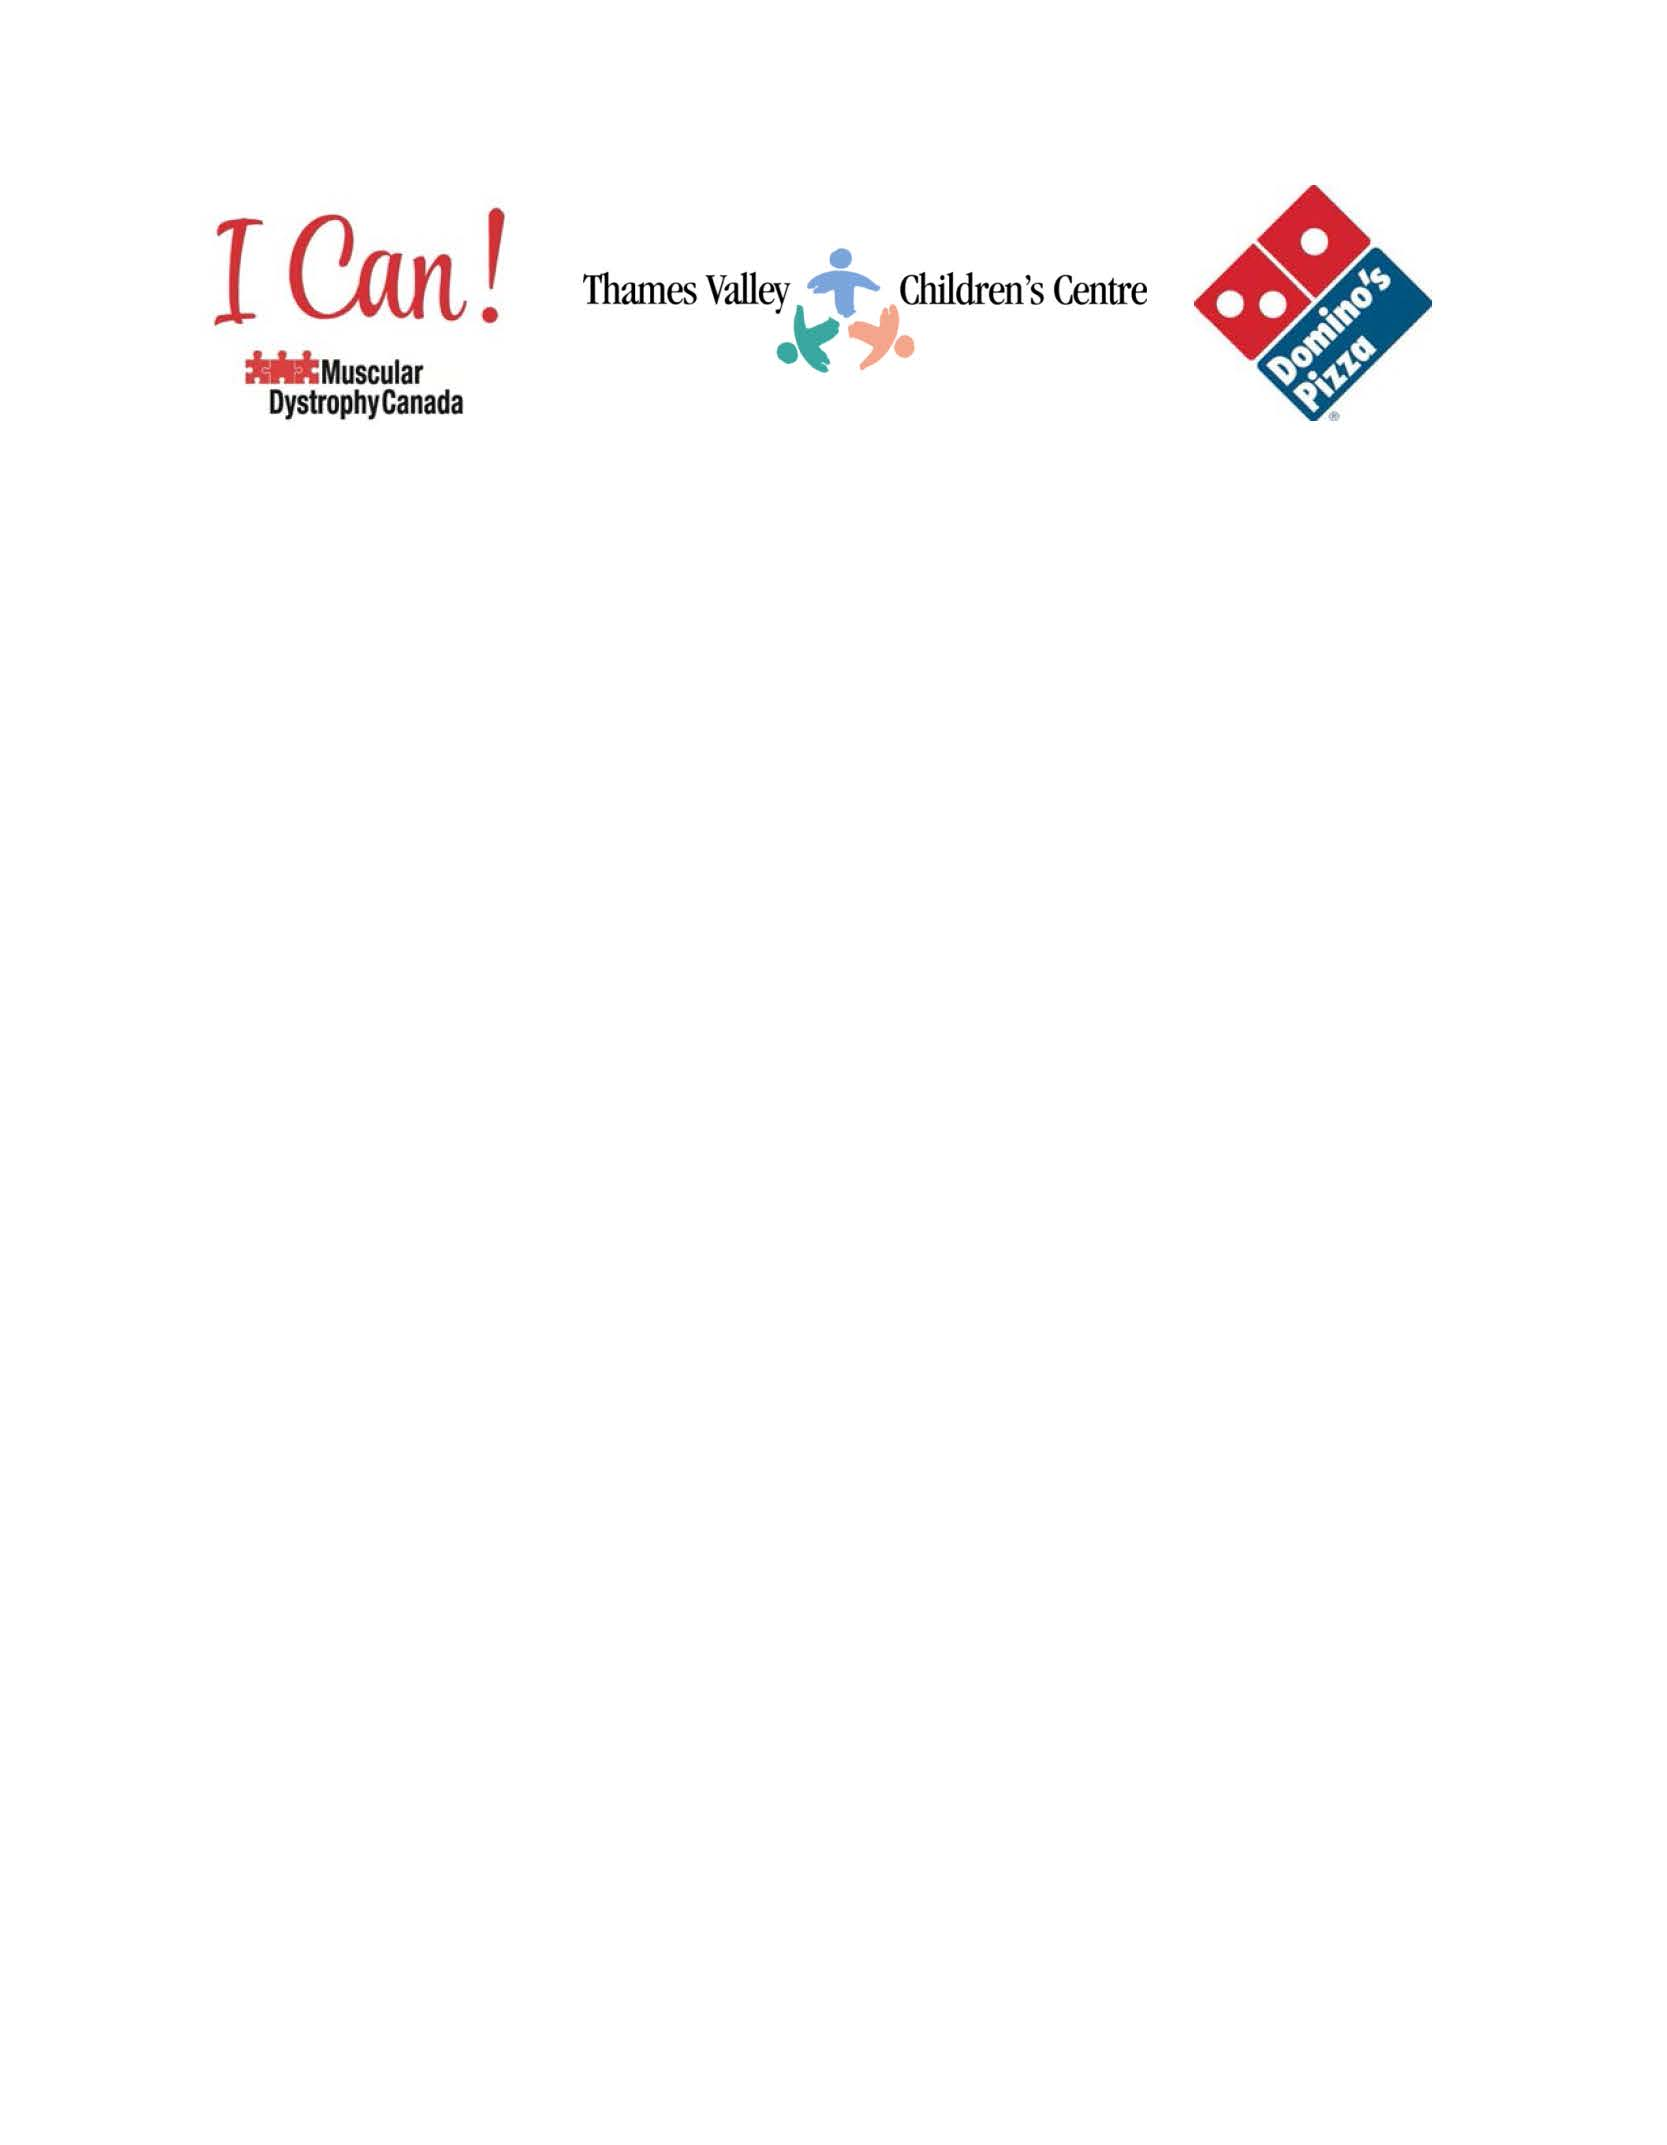 TVCC MDC and Dominos logos